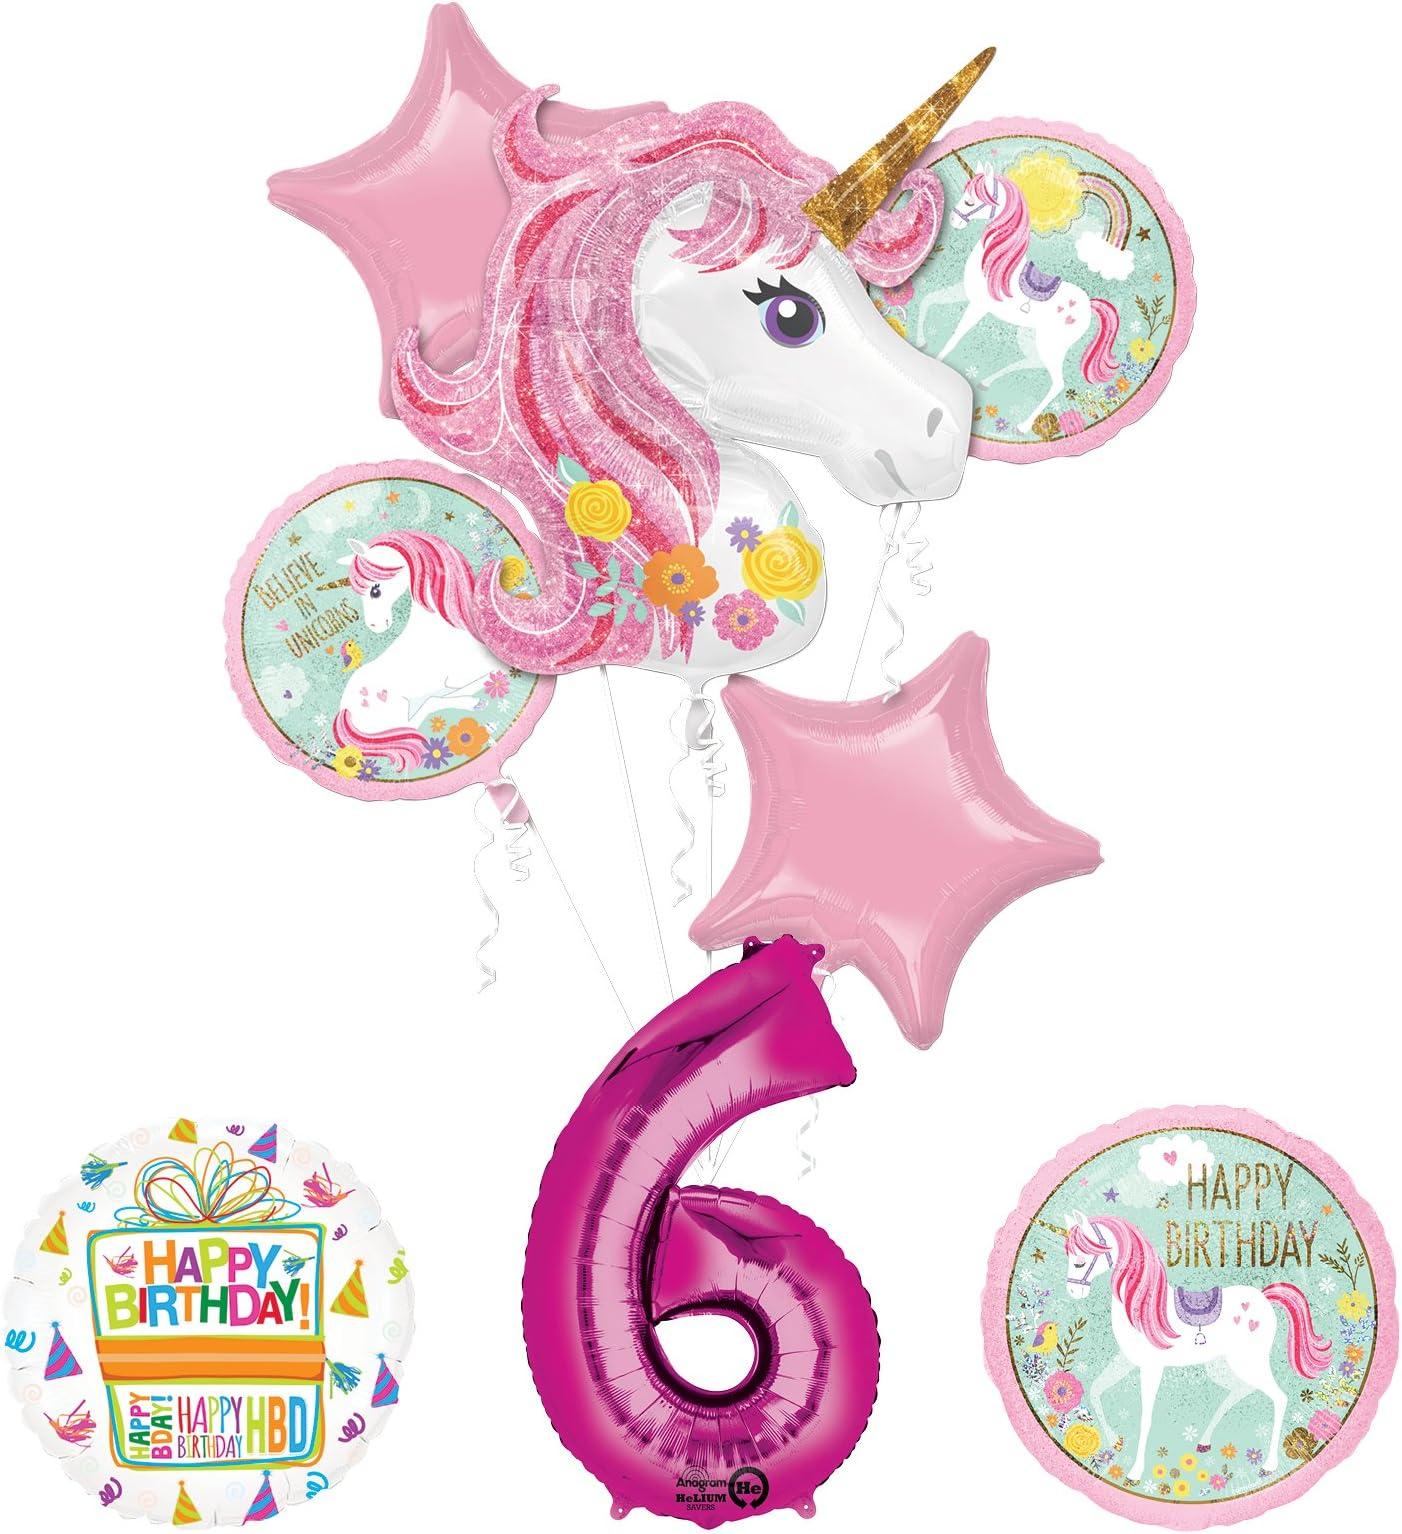 unicorn Birthday balloons green balloons party balloons 6 unicorn party Balloons